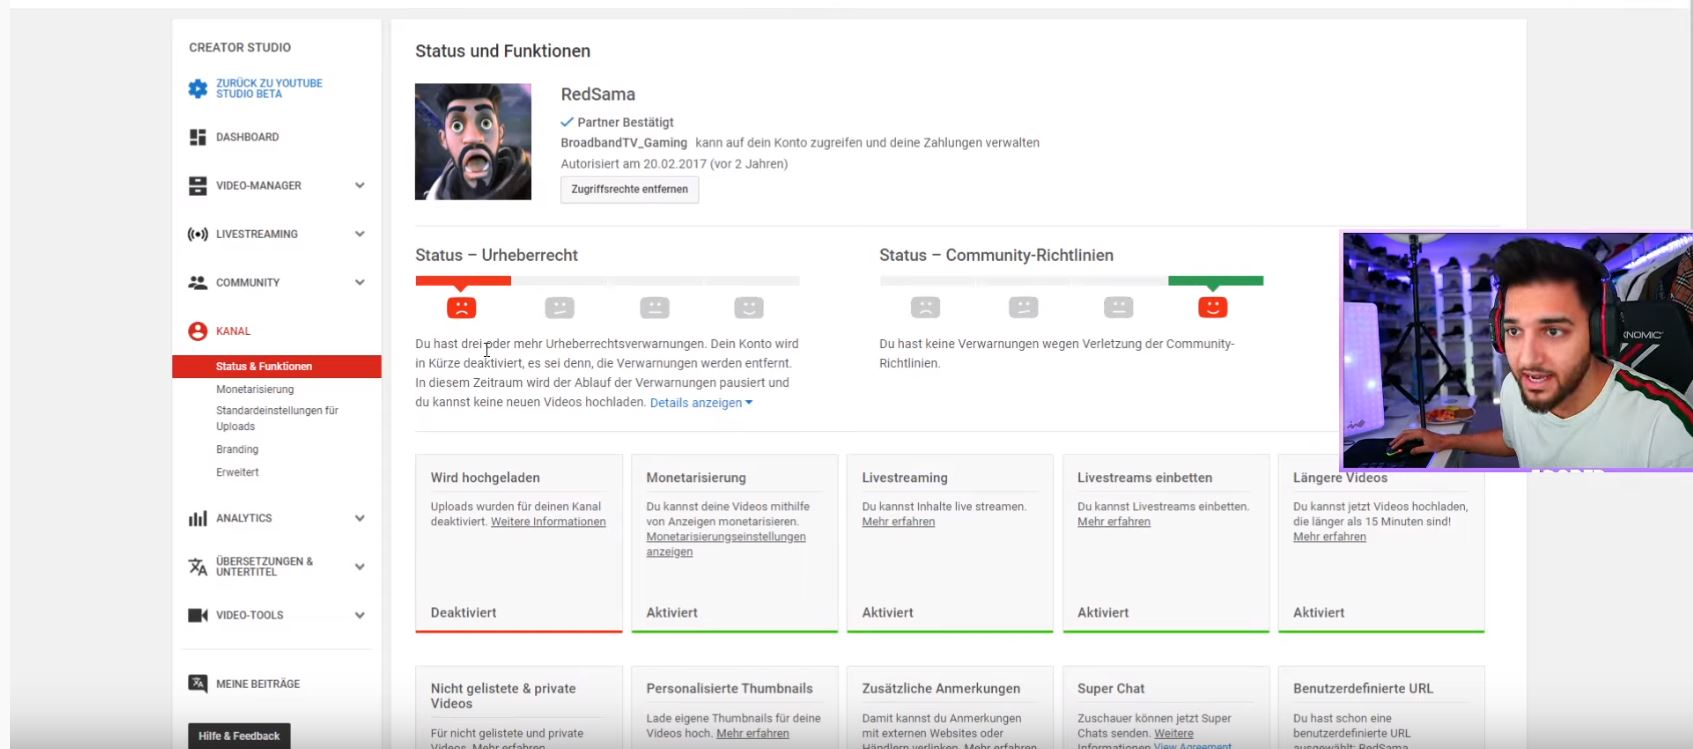 Fortnite: ApoRed sagt, Epic hasst ihn, lässt seinen YouTube-Kanal löschen